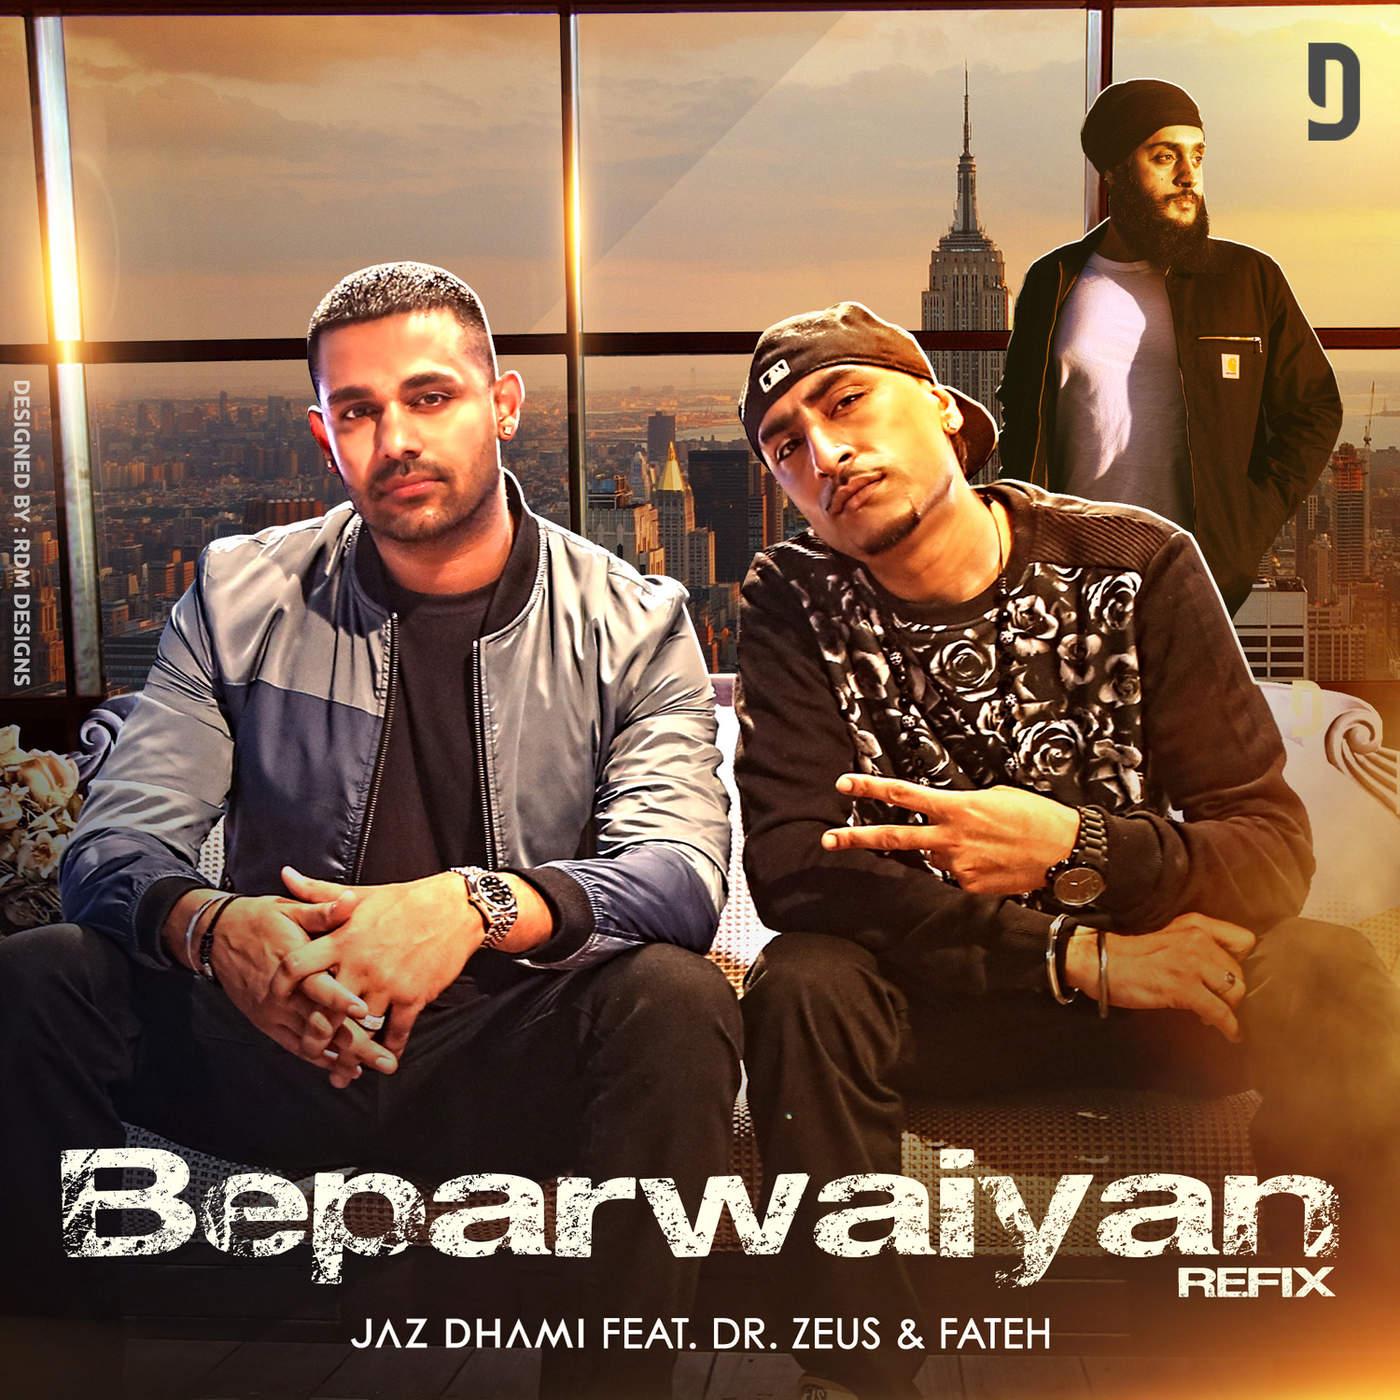 Jaz Dhami - Beparwaiyan Refix (feat. Dr. Zeus & Fateh) - Single Cover